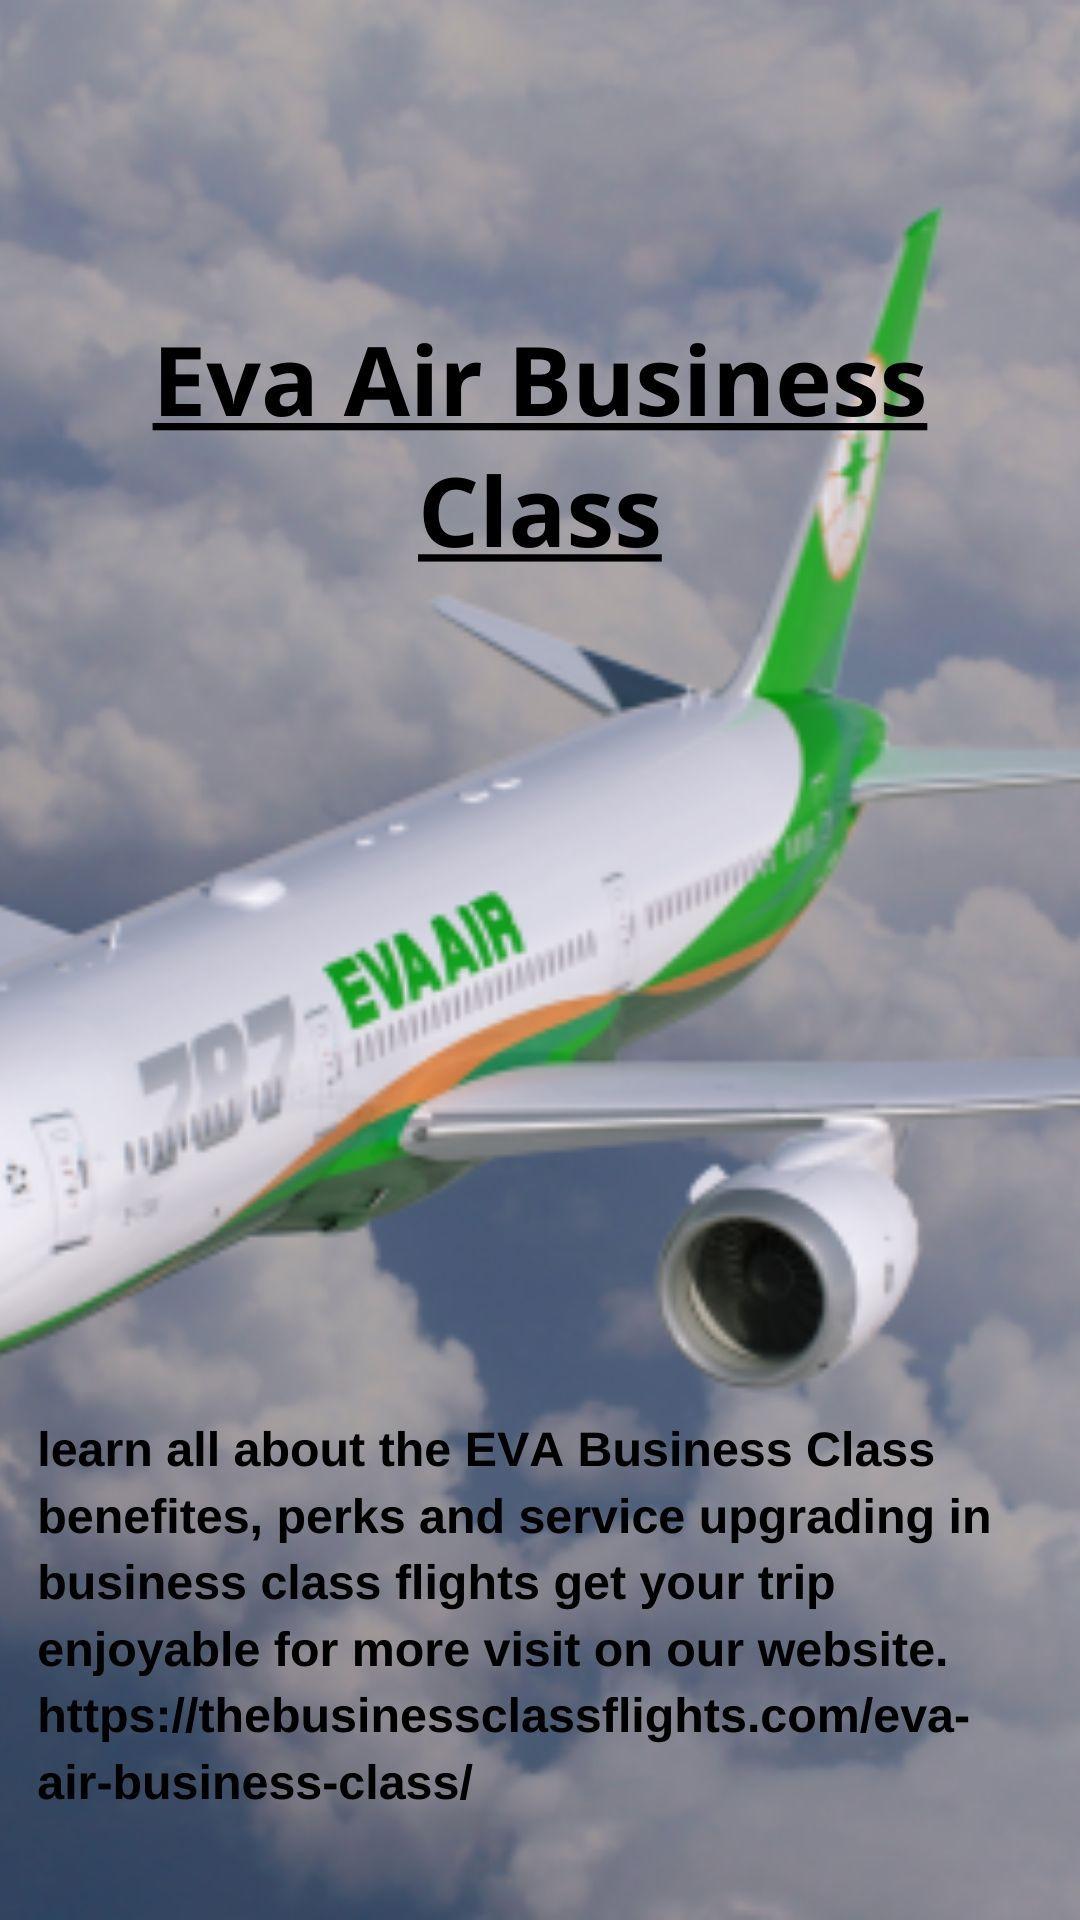 Get upto 40 Discount on Eva Air Business Class Flight